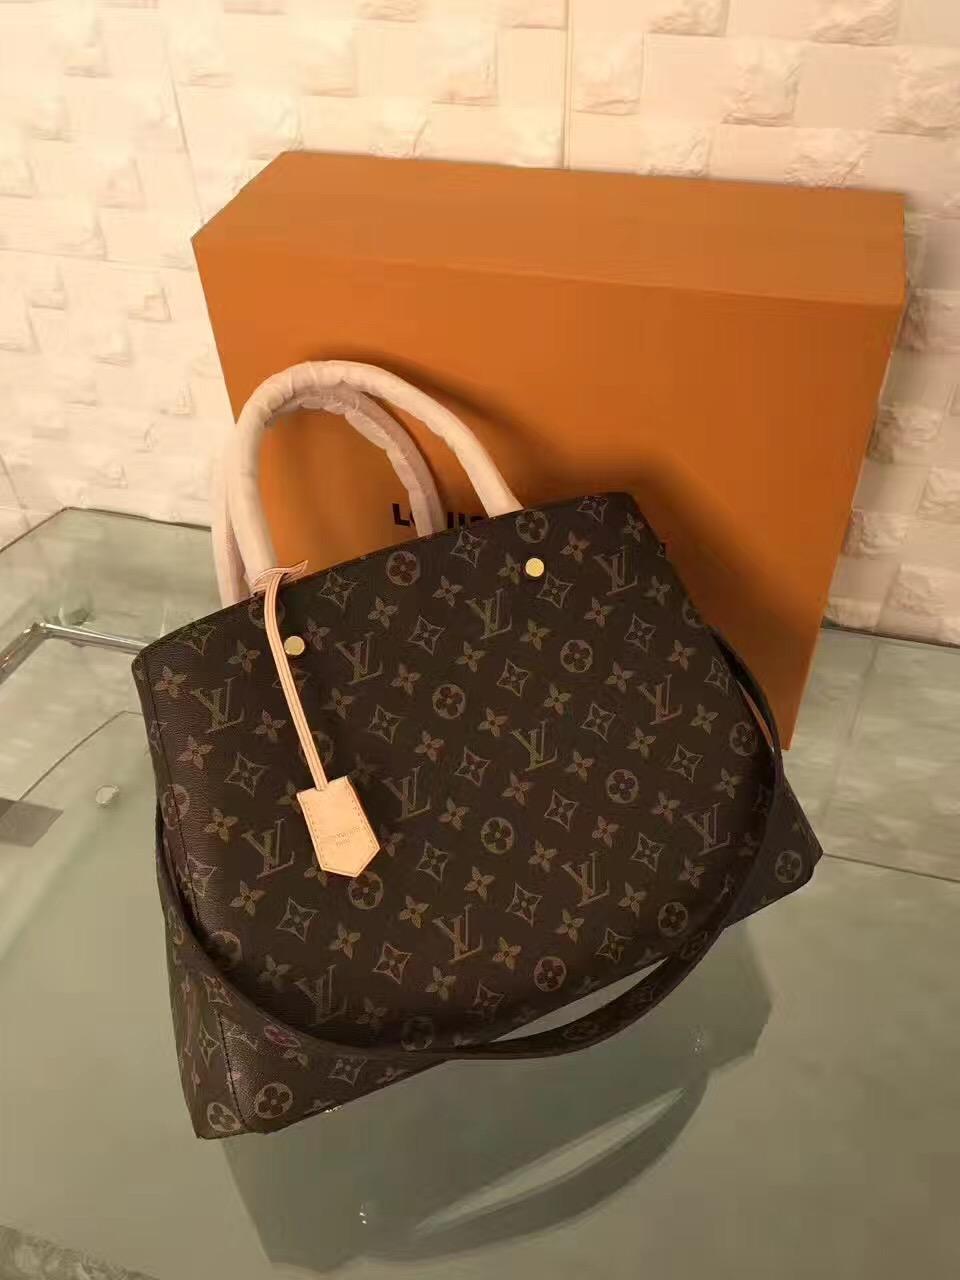 78d41c3ca21e LV Louis Vuitton M61253 Turenne Monogram Nano bags Handbags  LV1021 ...